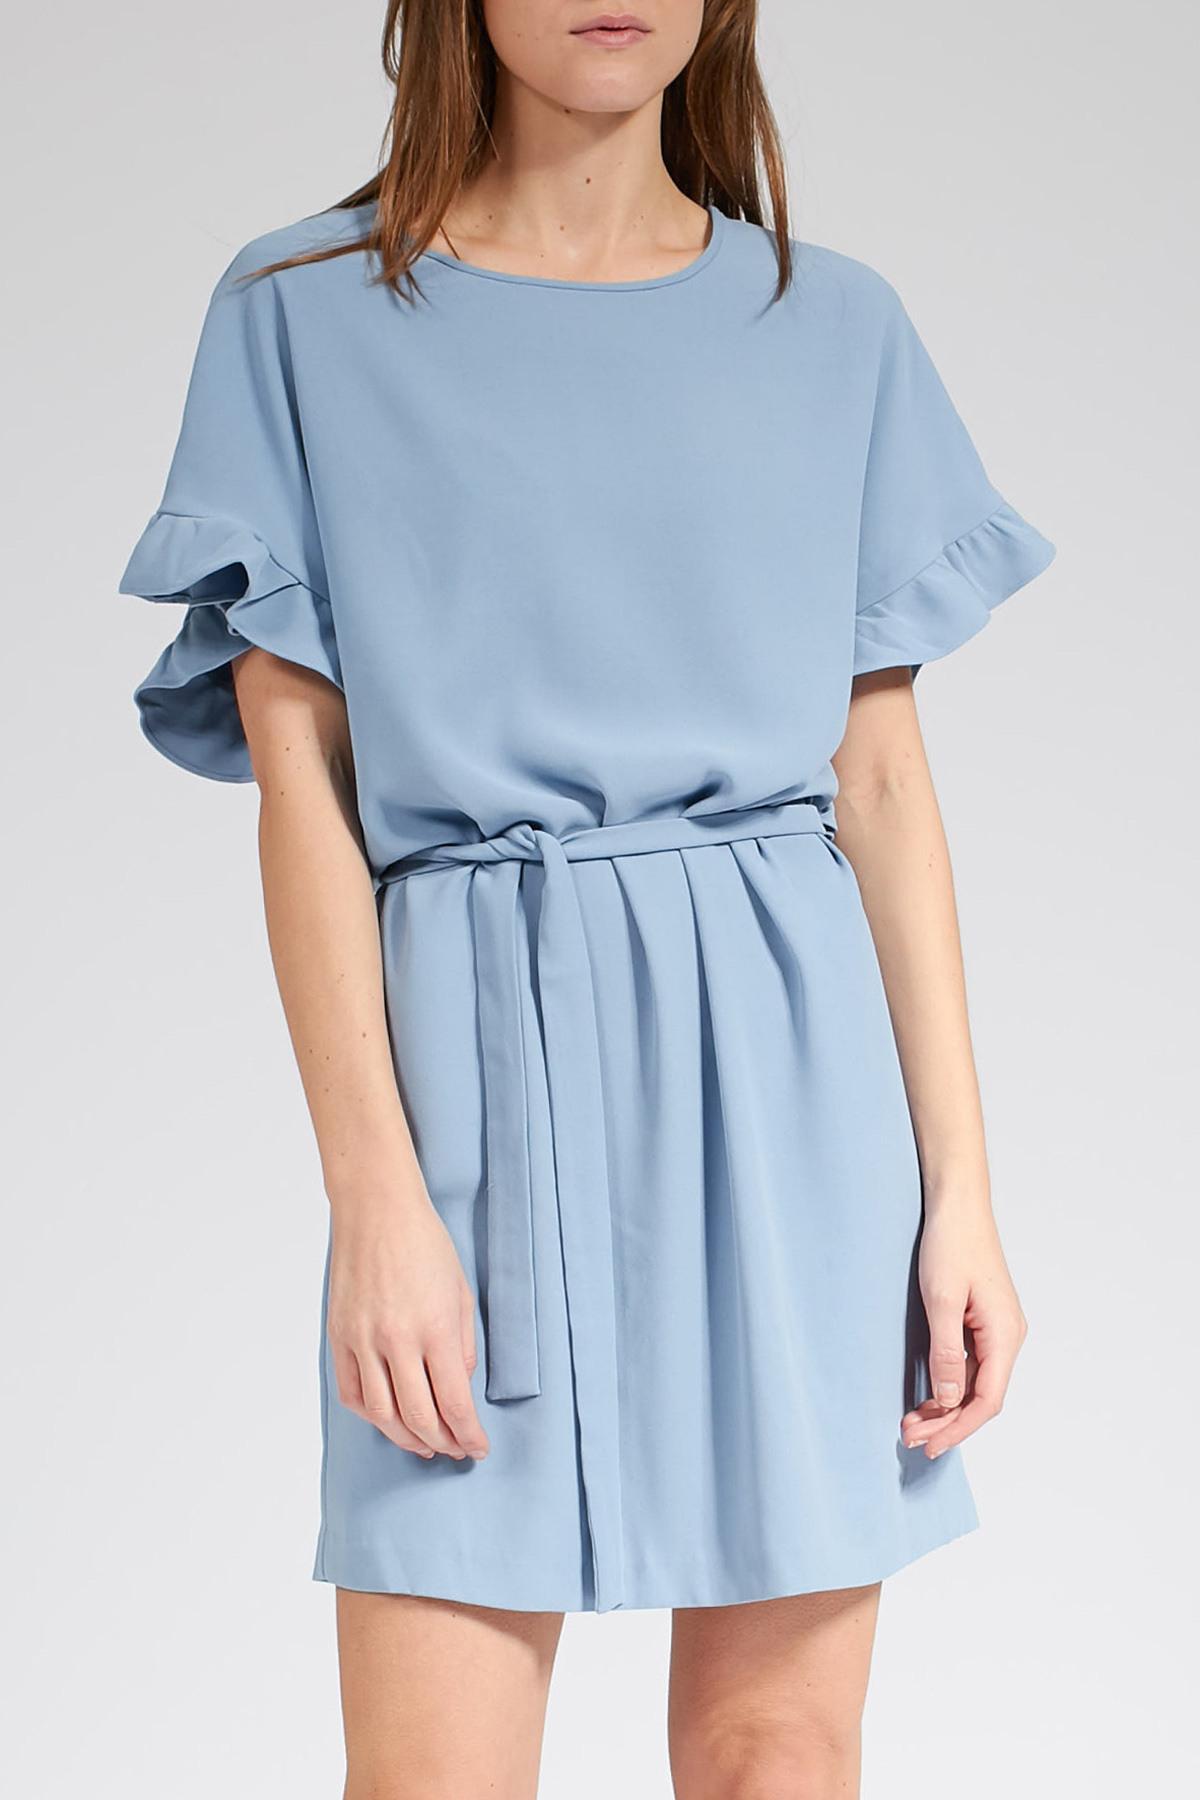 Knielanges Kleid Mit Volantdetails  Iheart  Myclassico